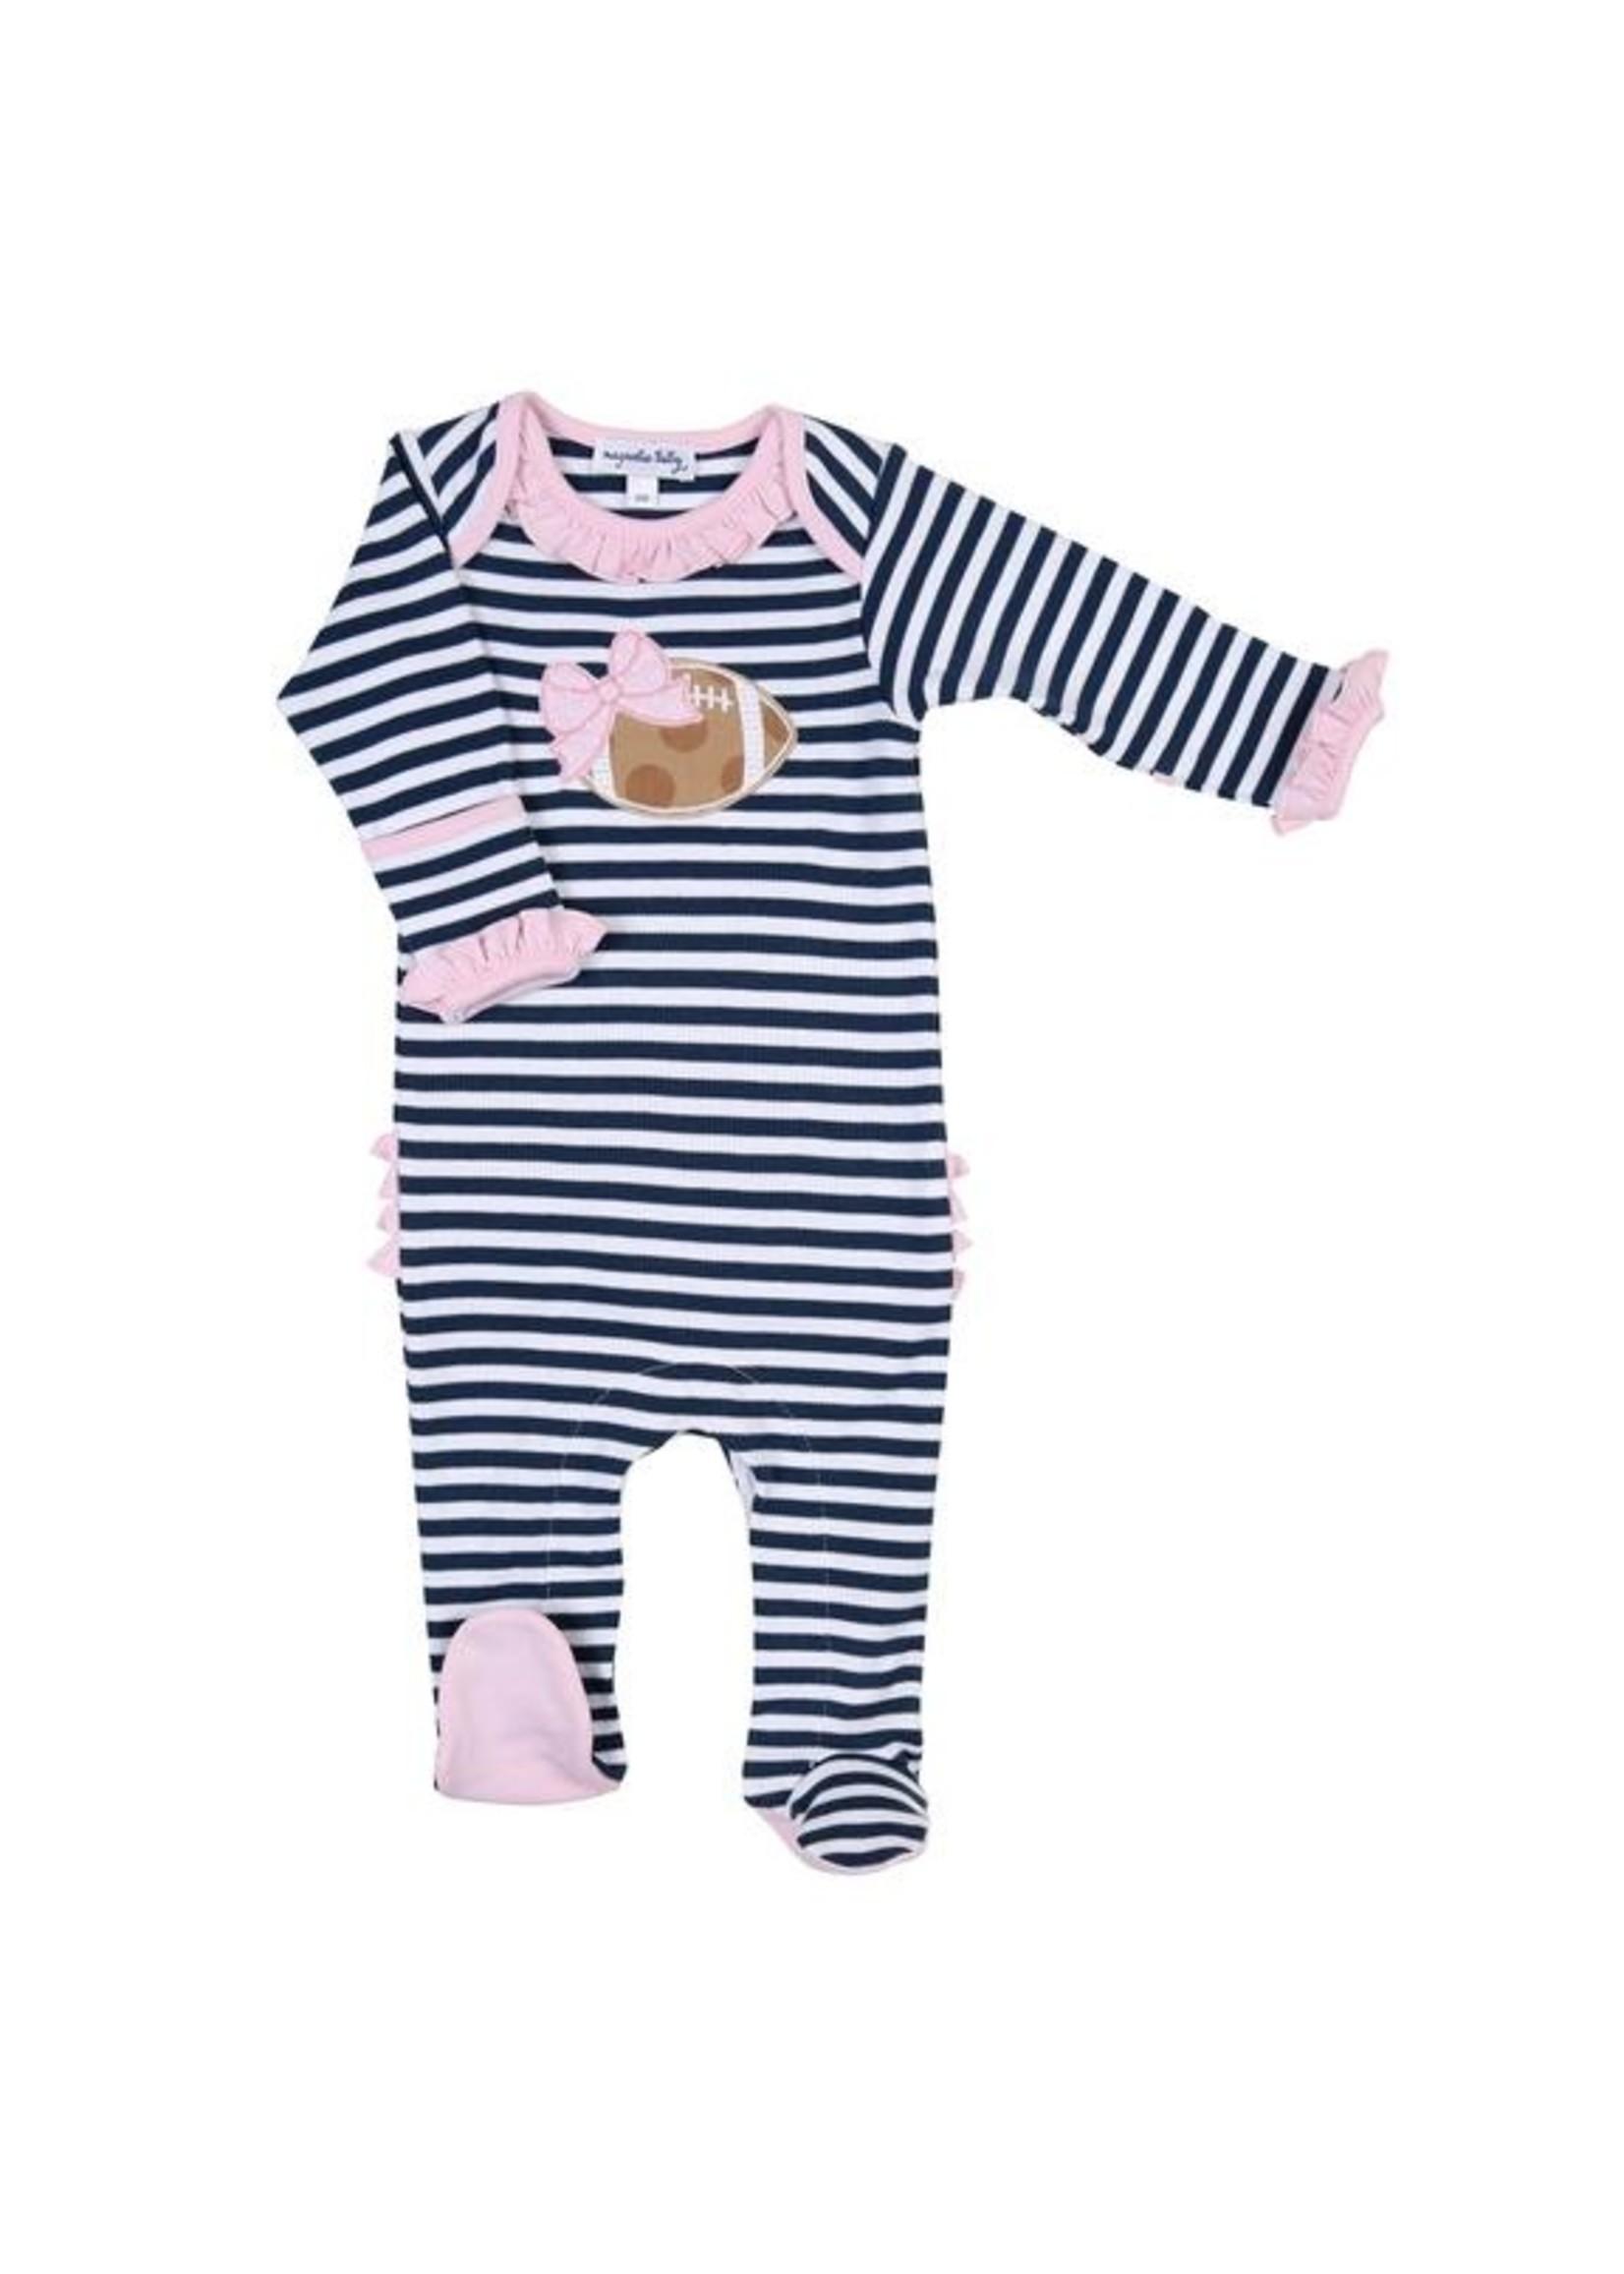 Magnolia Baby Football Stripes  Ruffle Lap Footie